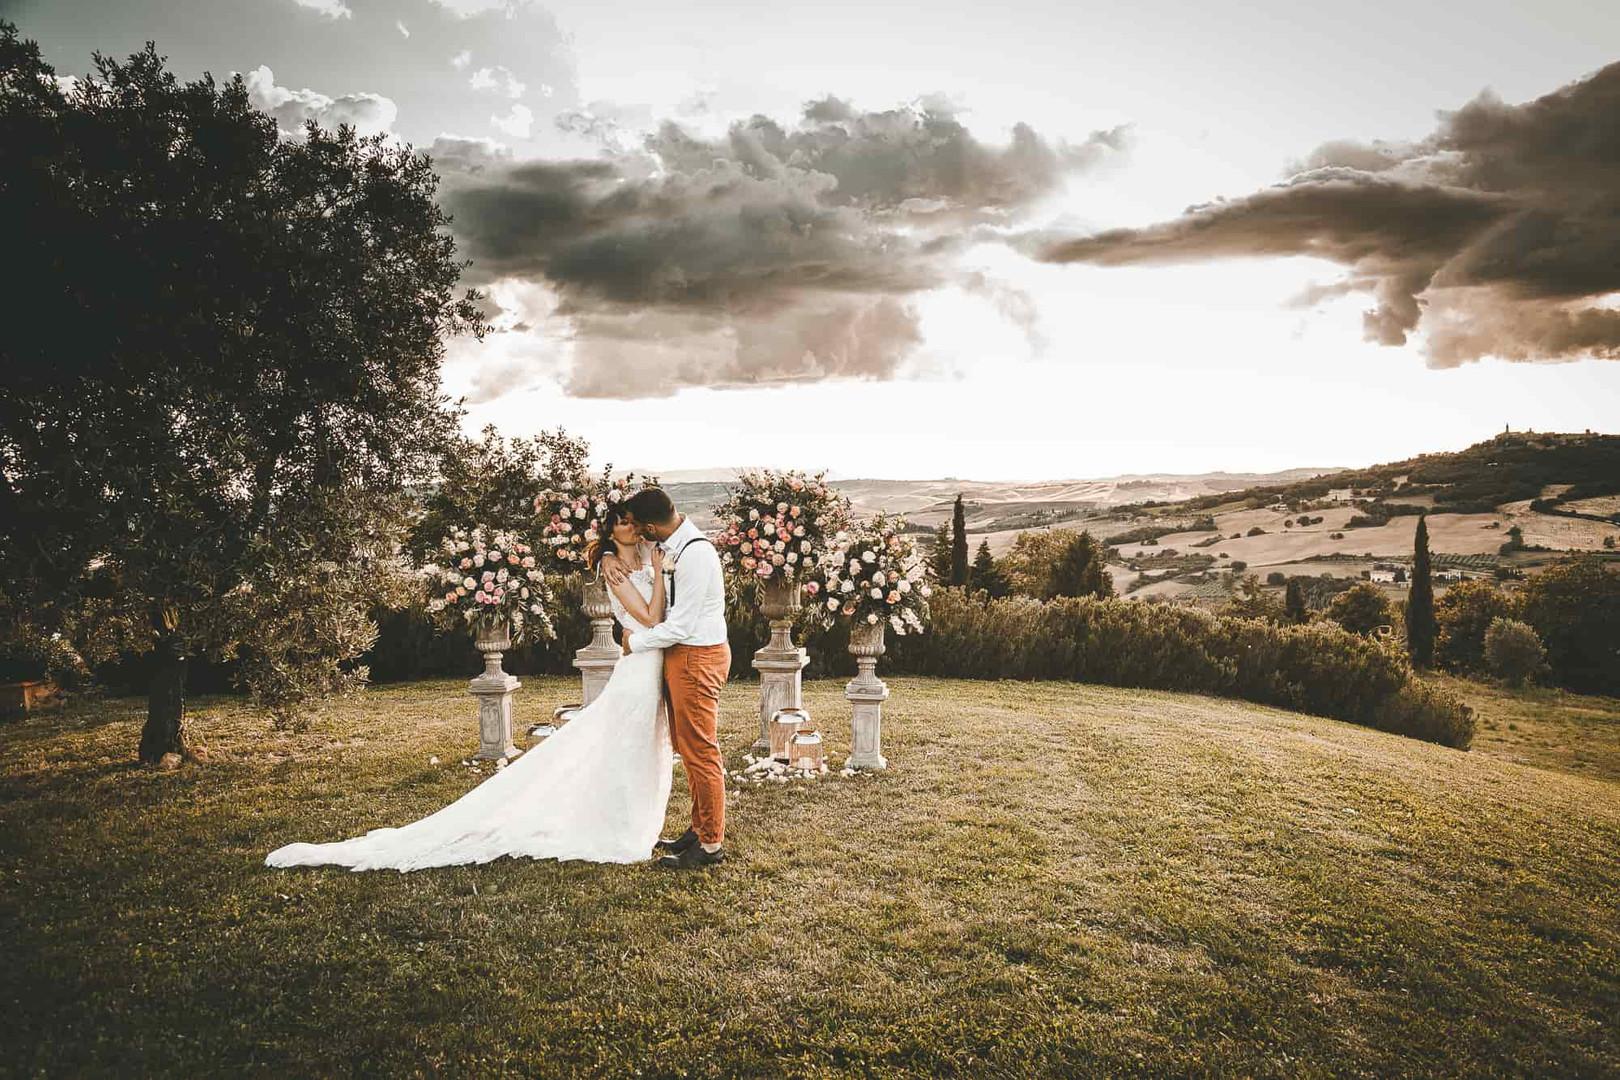 Wedding - Andrea Viti Photographer.jpg